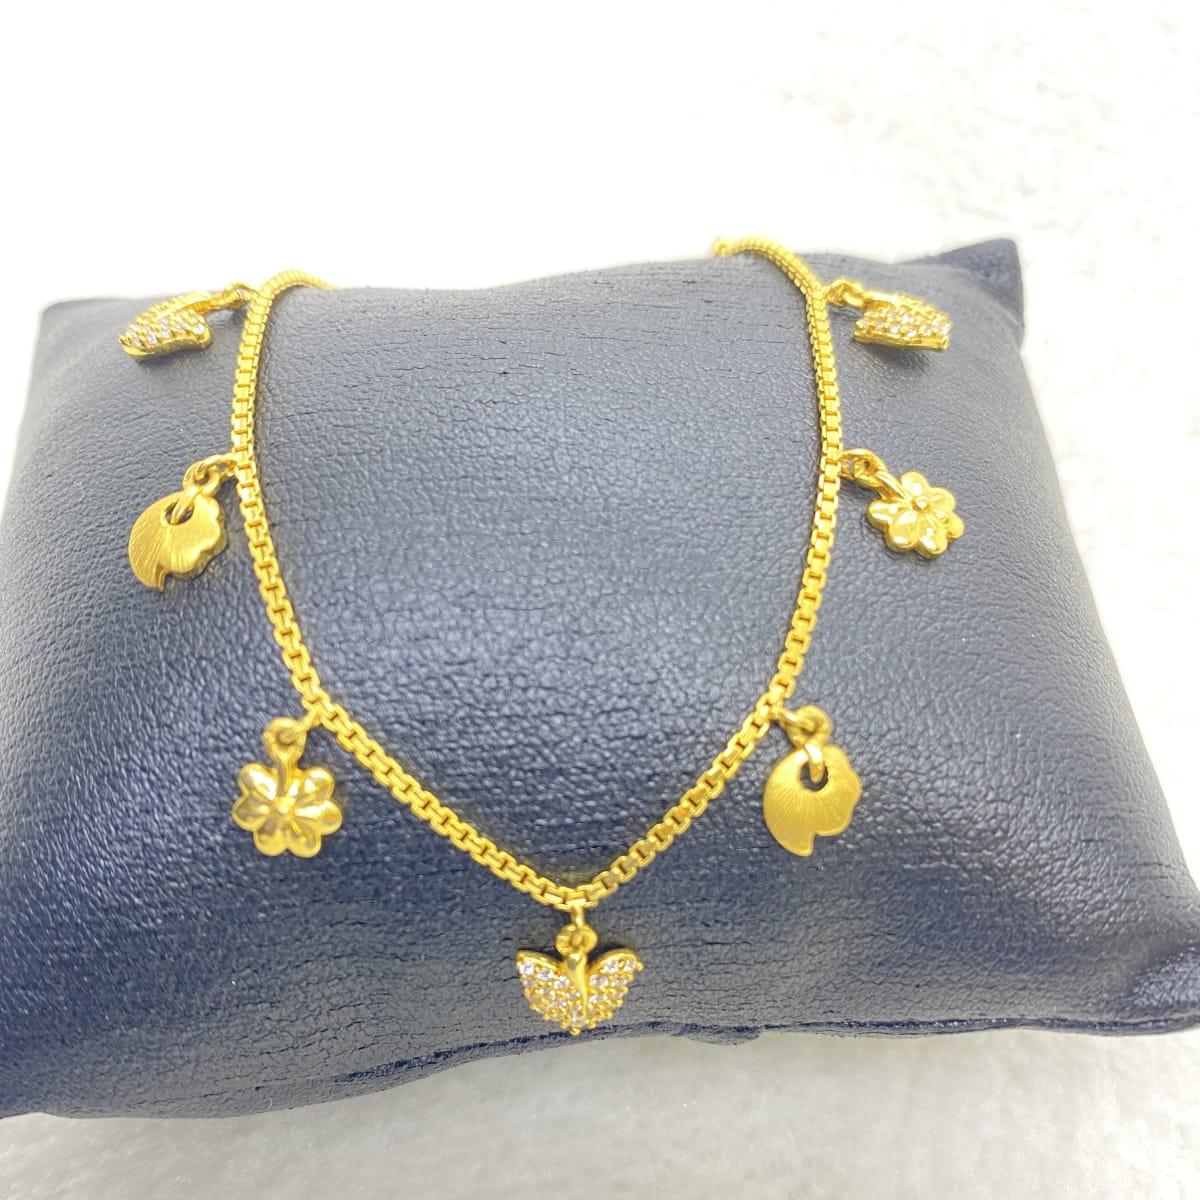 Fancy Charms Ladies Bracelet Gj0110